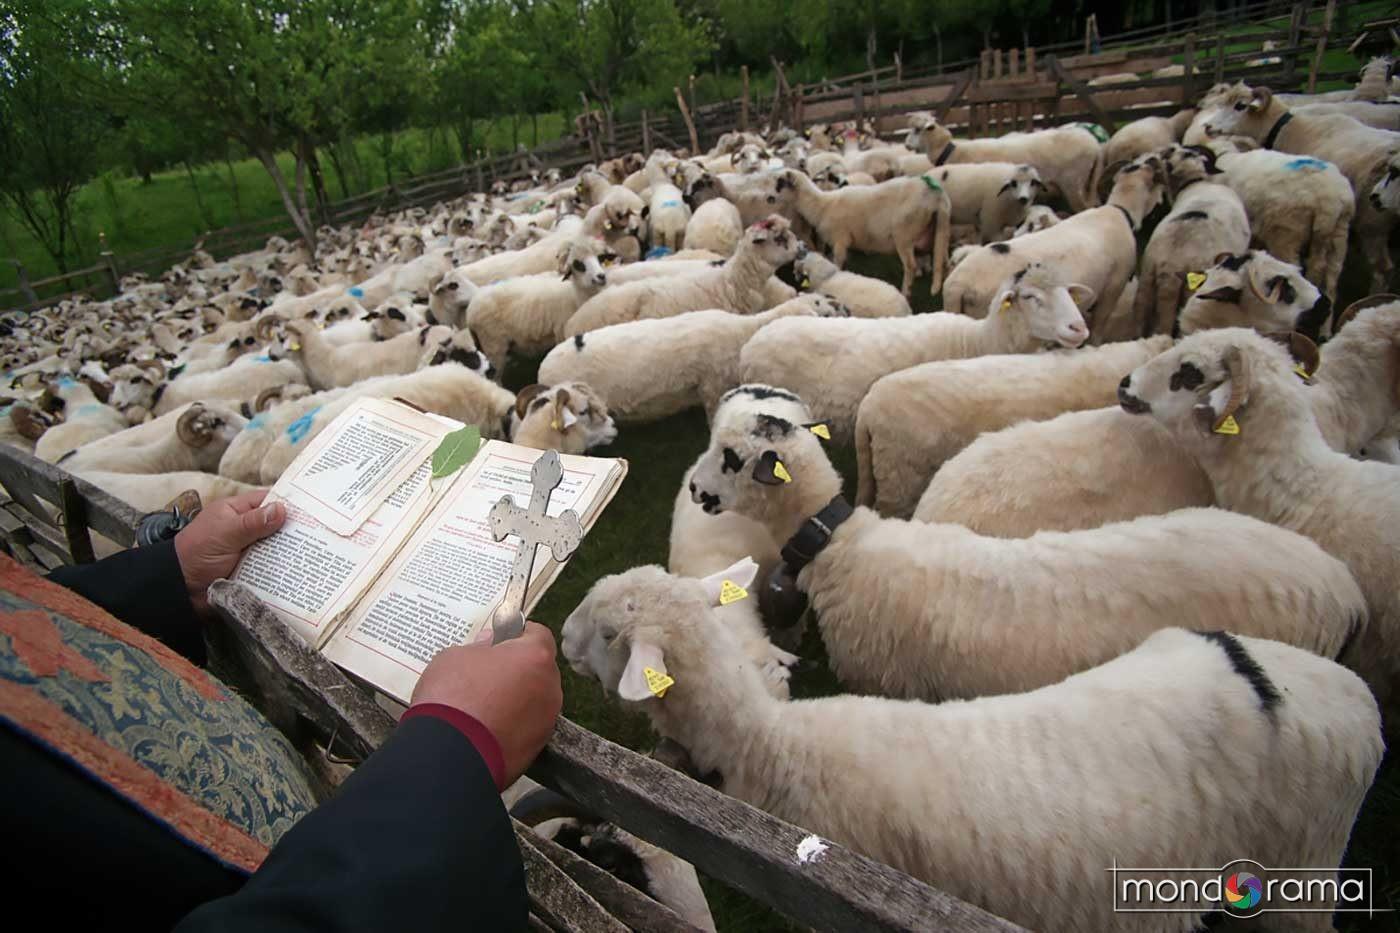 © Remus Tiplea - Confesiuni religioase, Sfintitul si binecuvantatul oilor, Camarzana, 2016